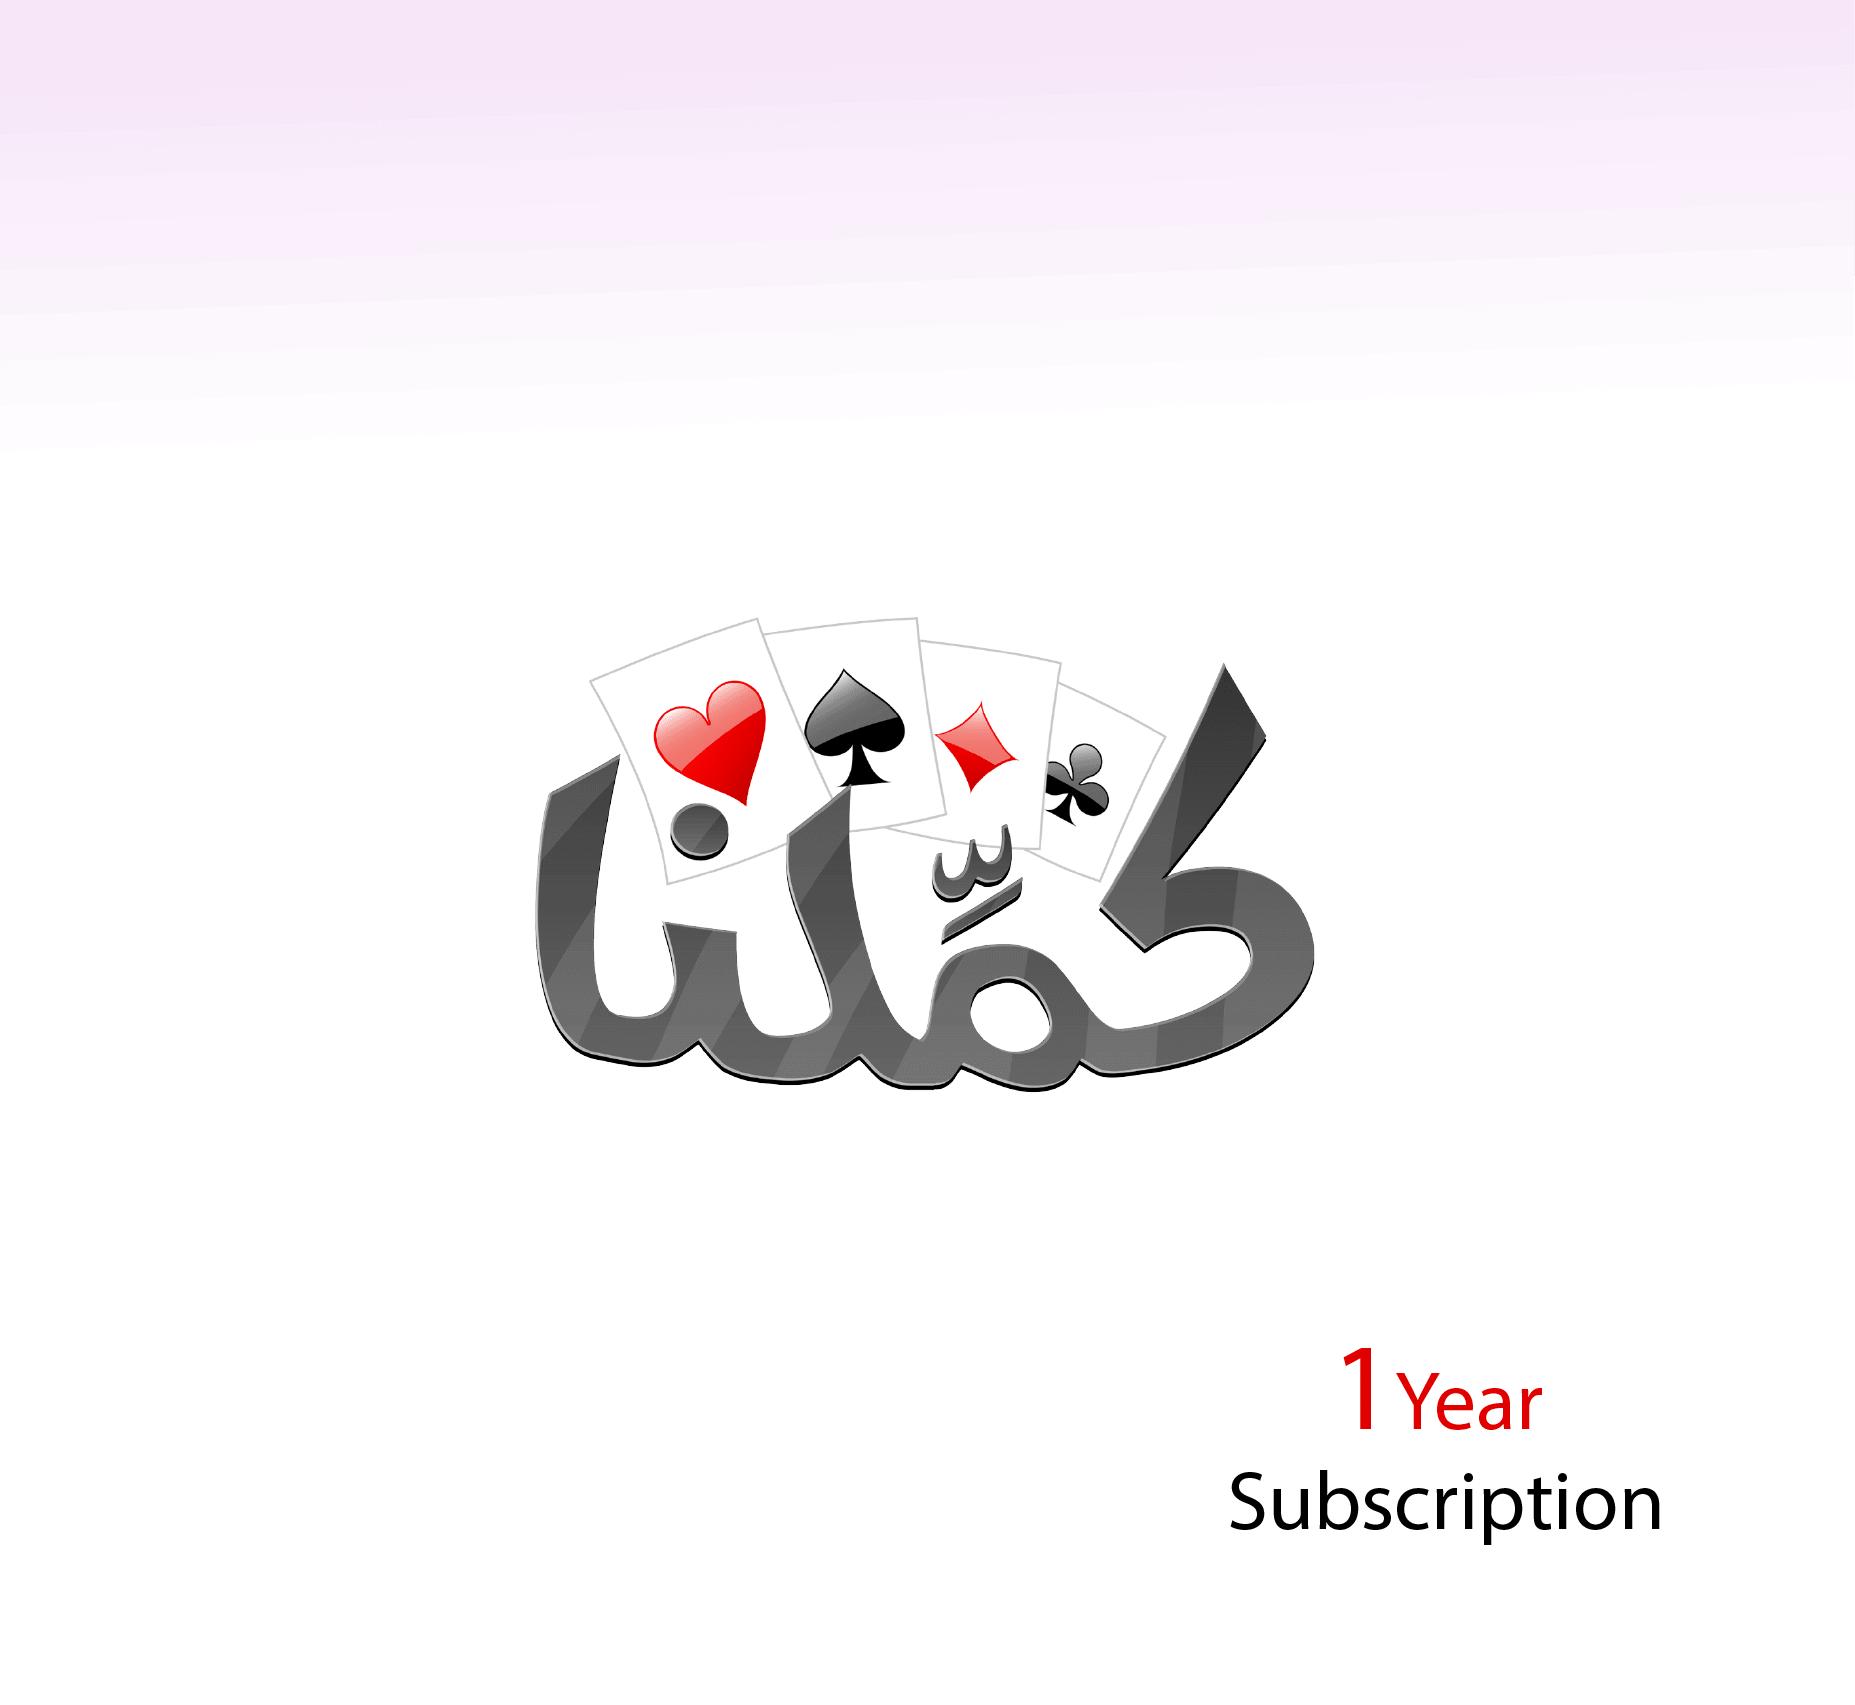 Kamelna [KSA] - 1 Year Subscription